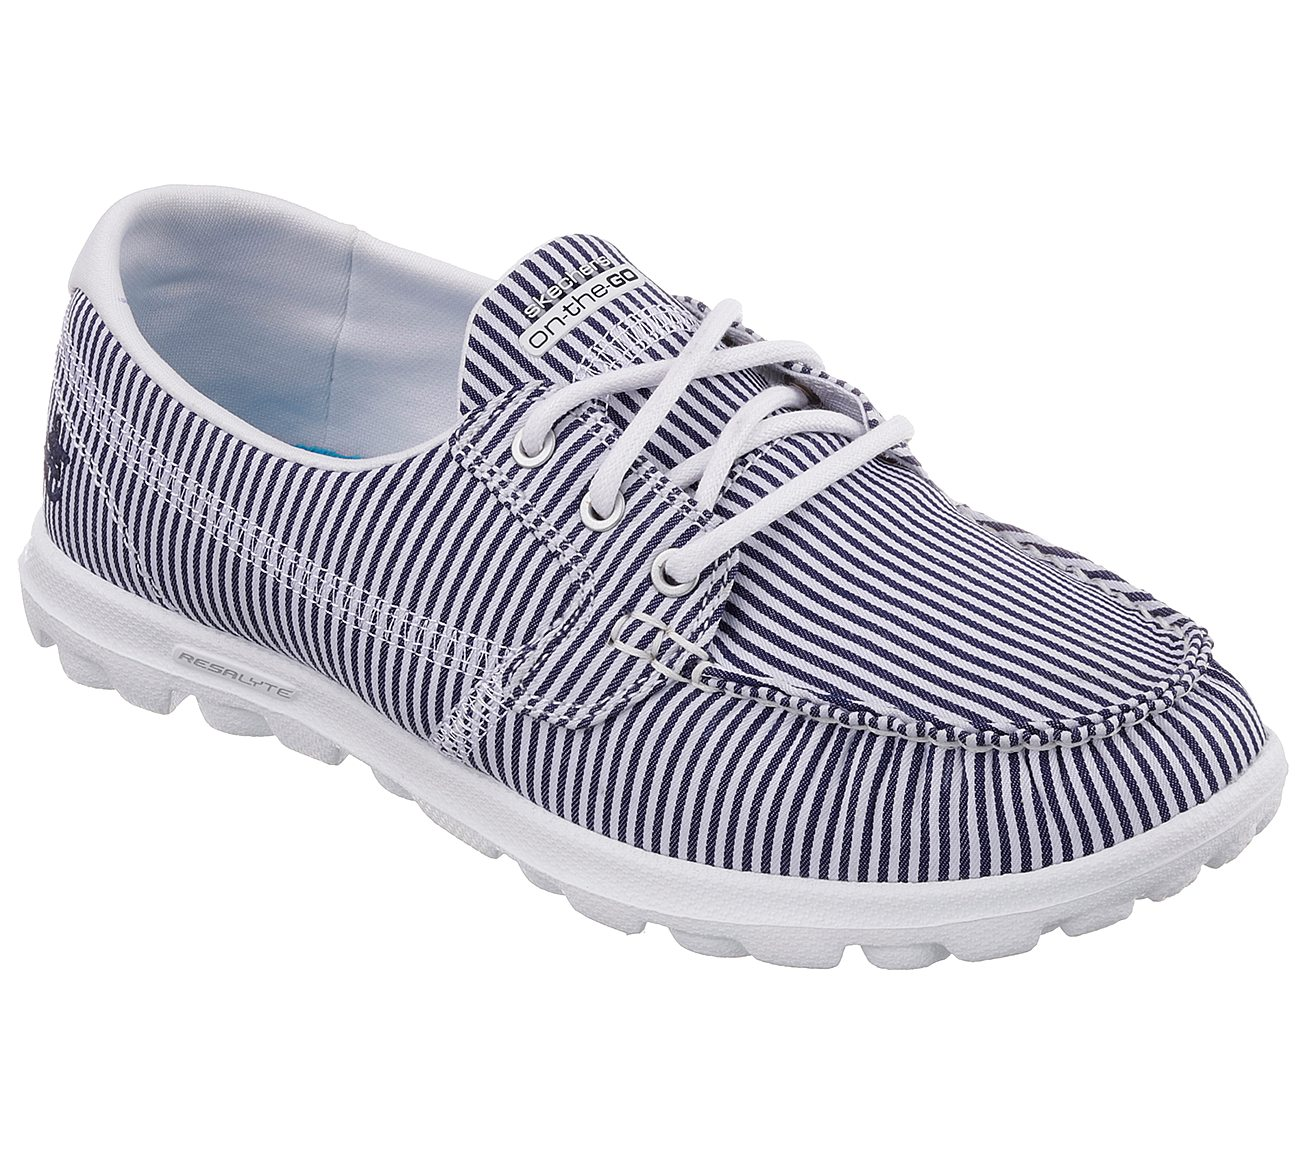 Spinnaker Skechers On the GO Shoes